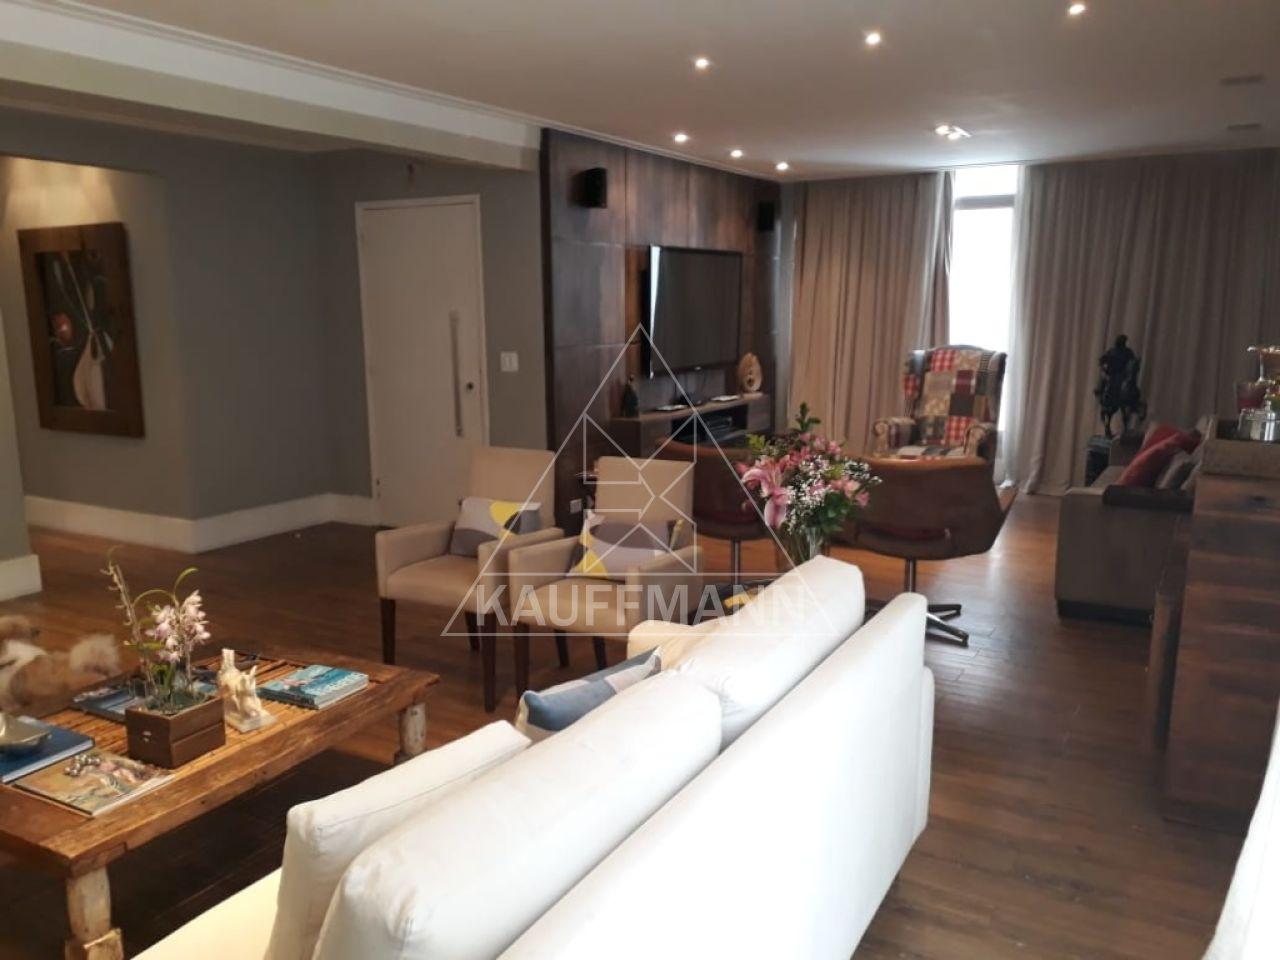 apartamento-venda-sao-paulo-jardim-paulista-3dormitorios-3suites-1vaga-174m2-Foto3